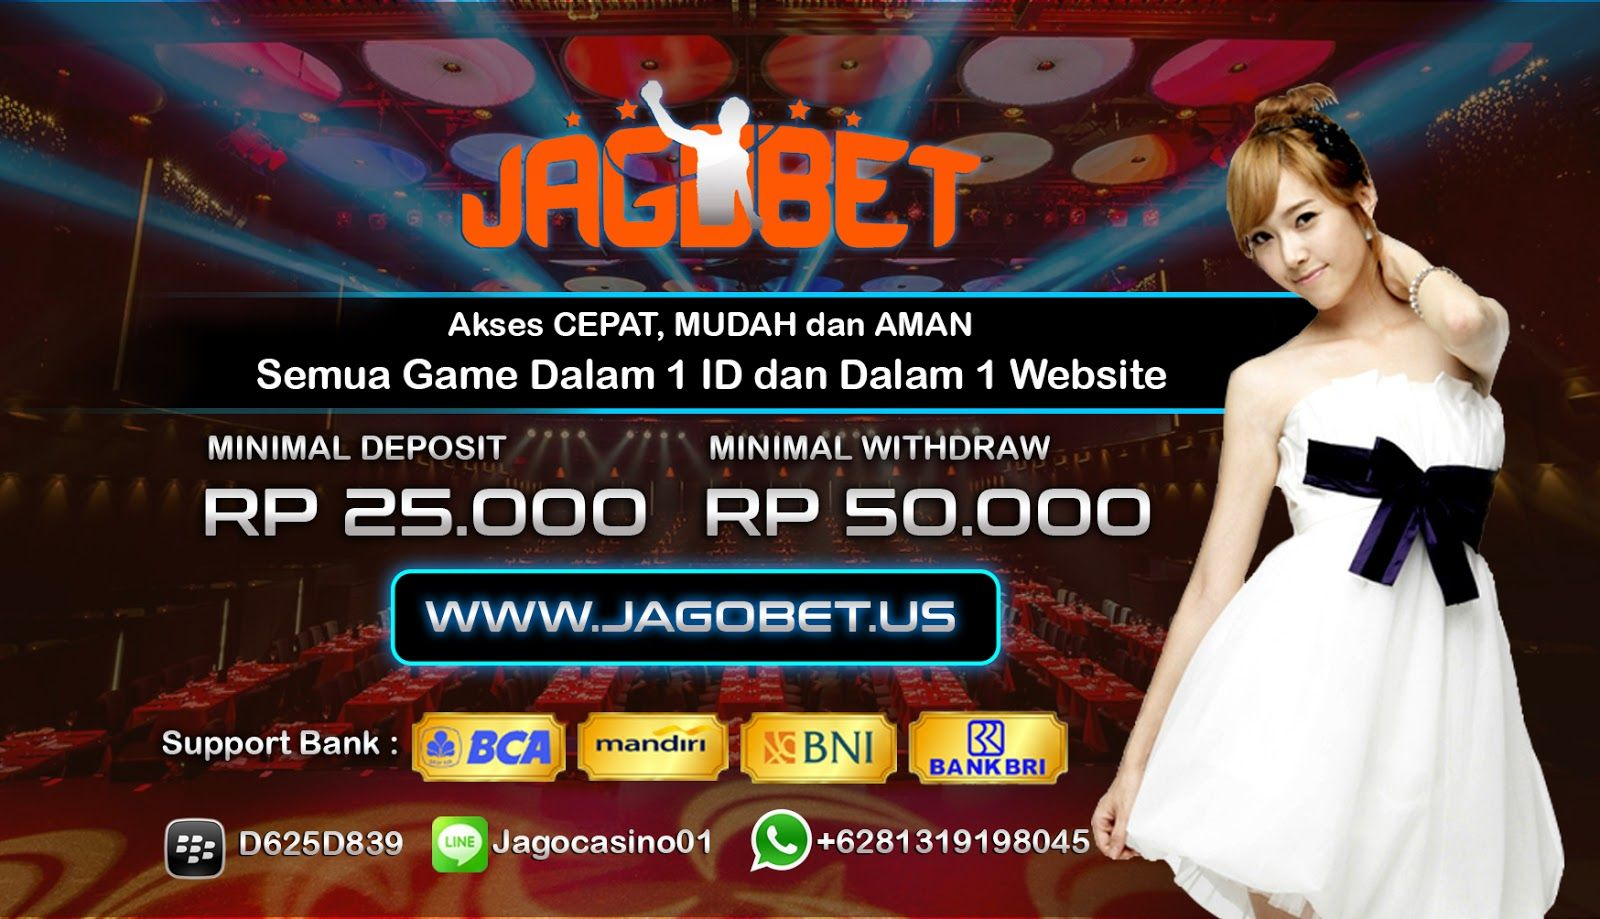 Agen Betting Casino Online